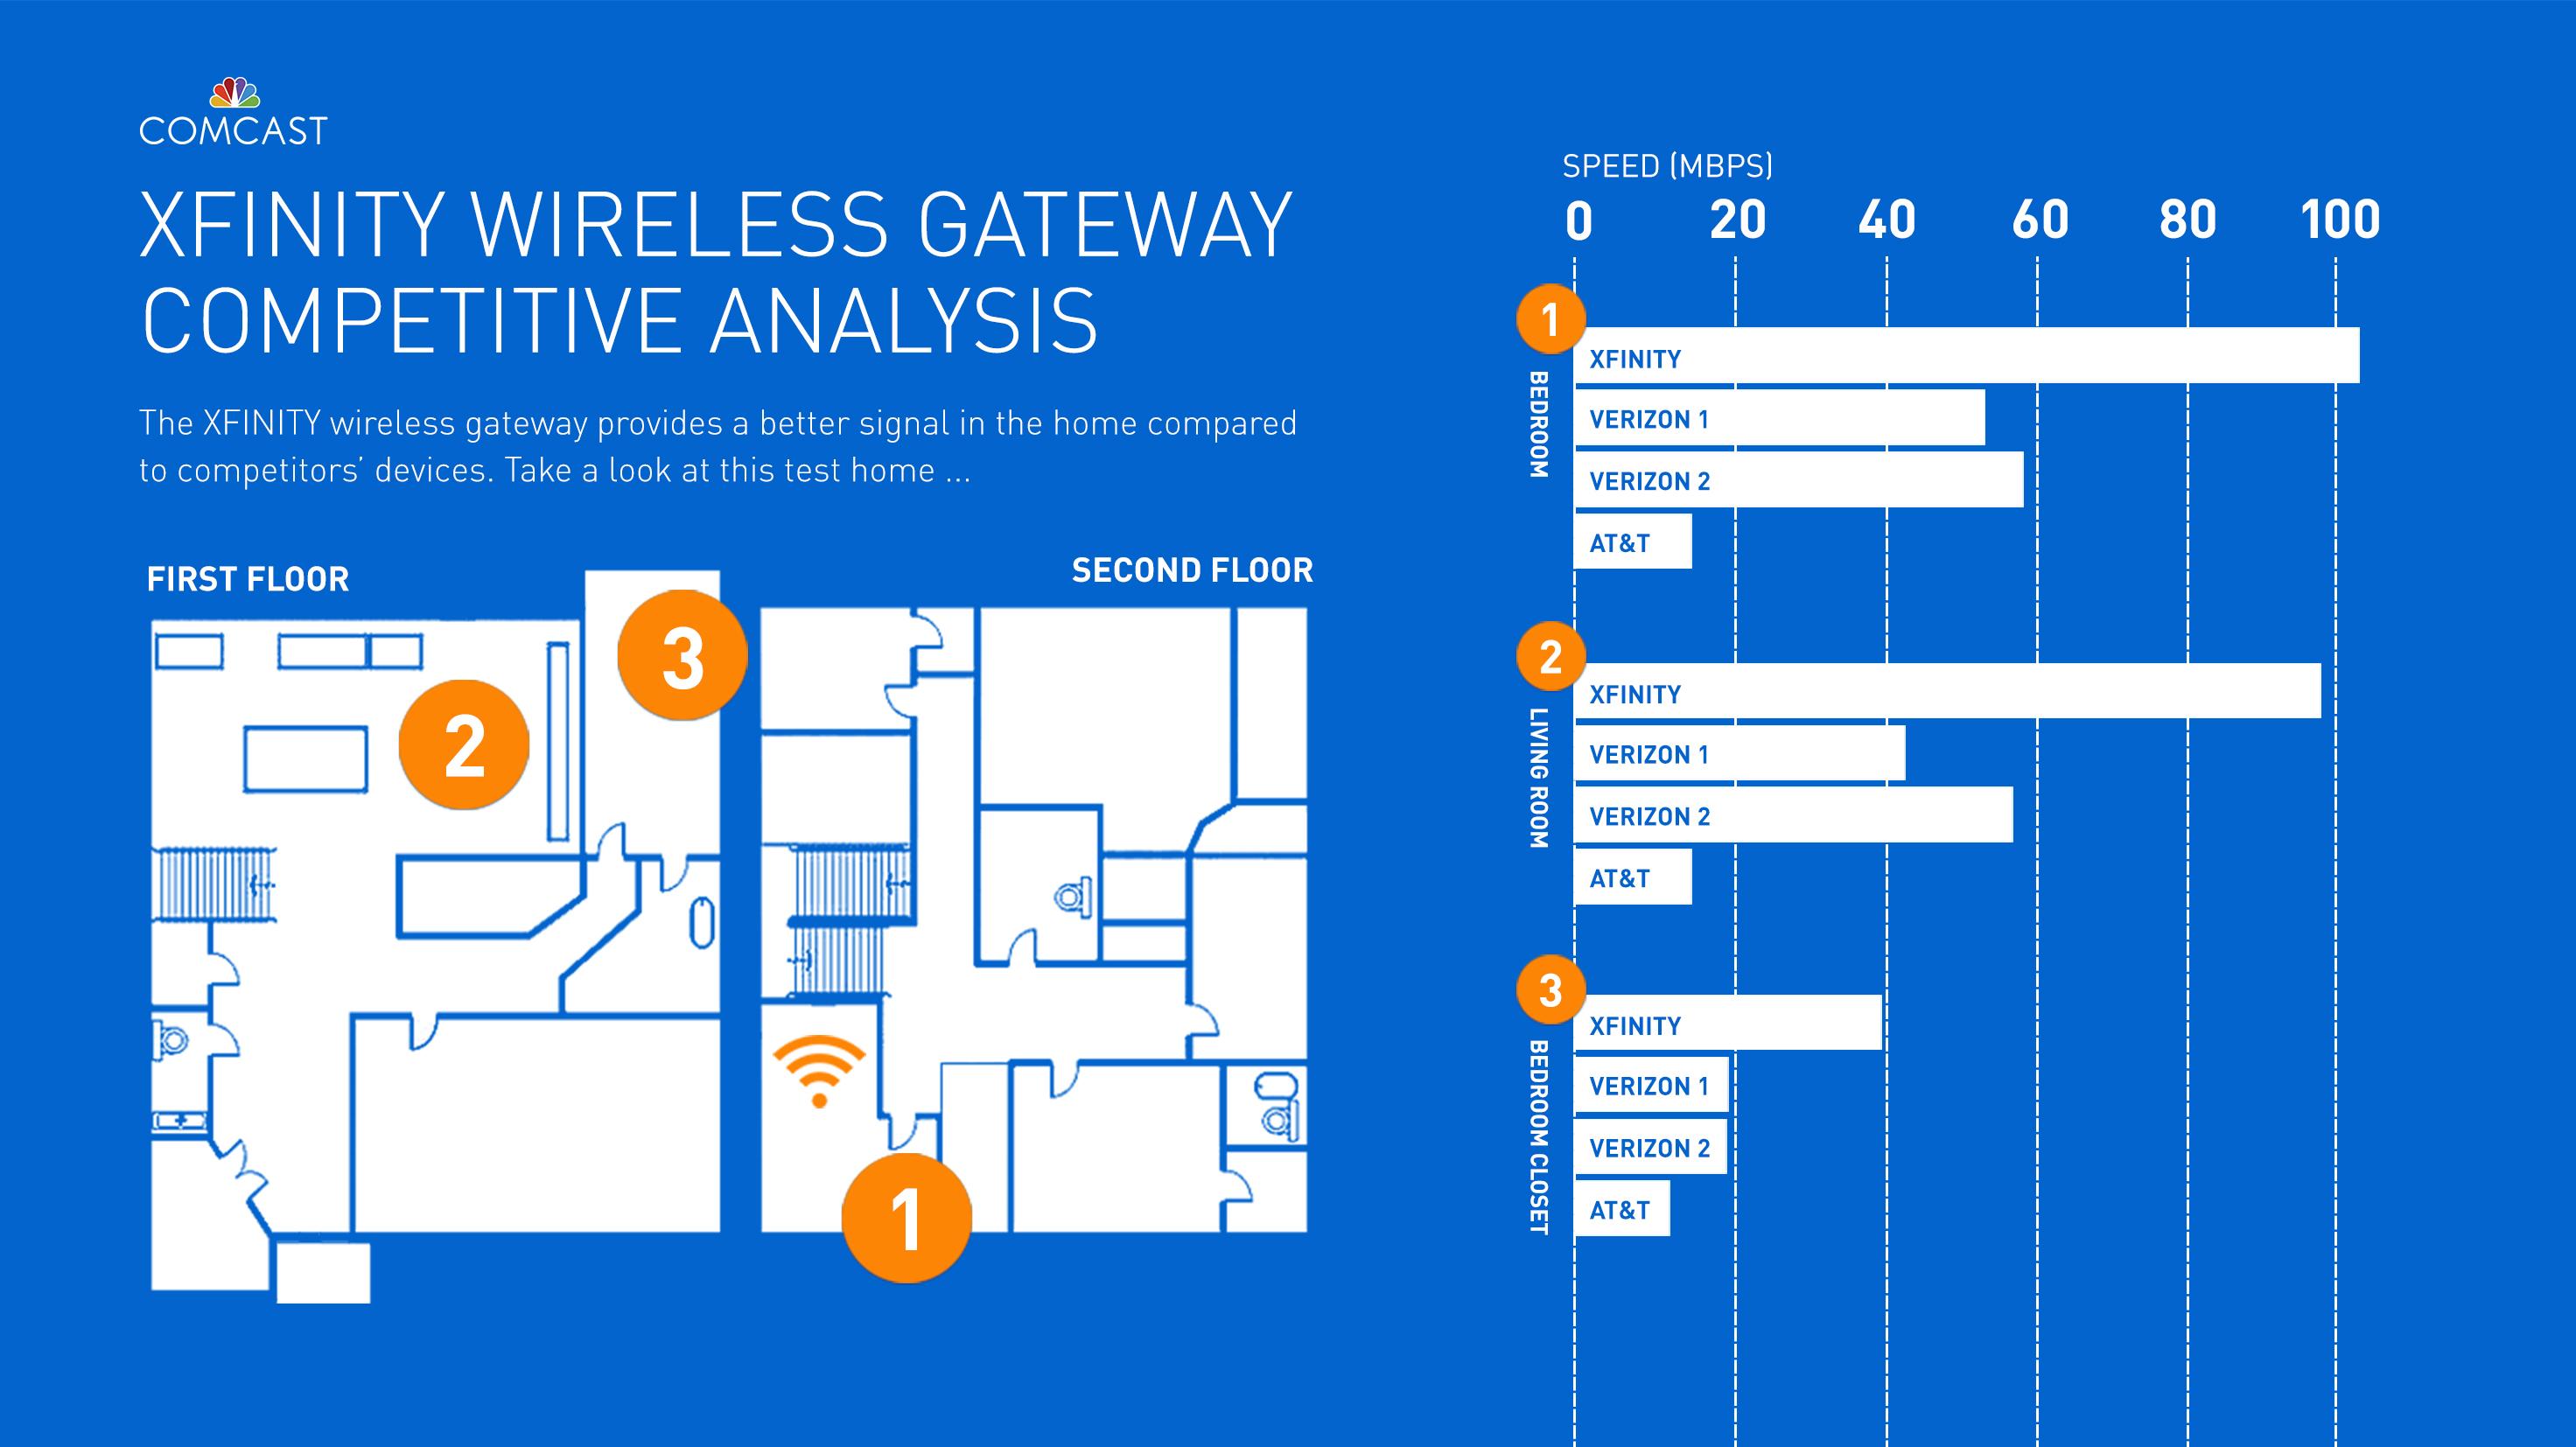 comcast wireless diagram data wiring diagram schematic Samsung TV Wiring Diagram comcast wireless router wiring diagram wiring diagram comcast xfinity diagram comcast wireless diagram